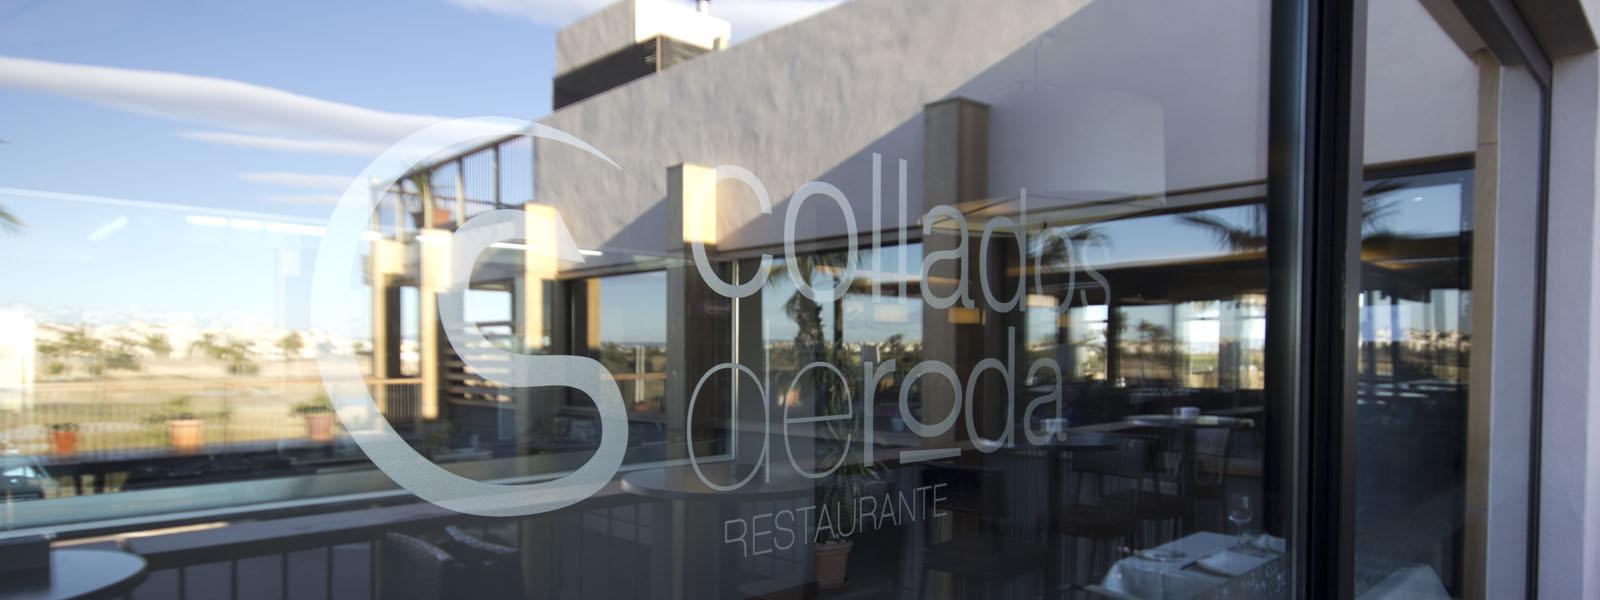 Roda restaurant